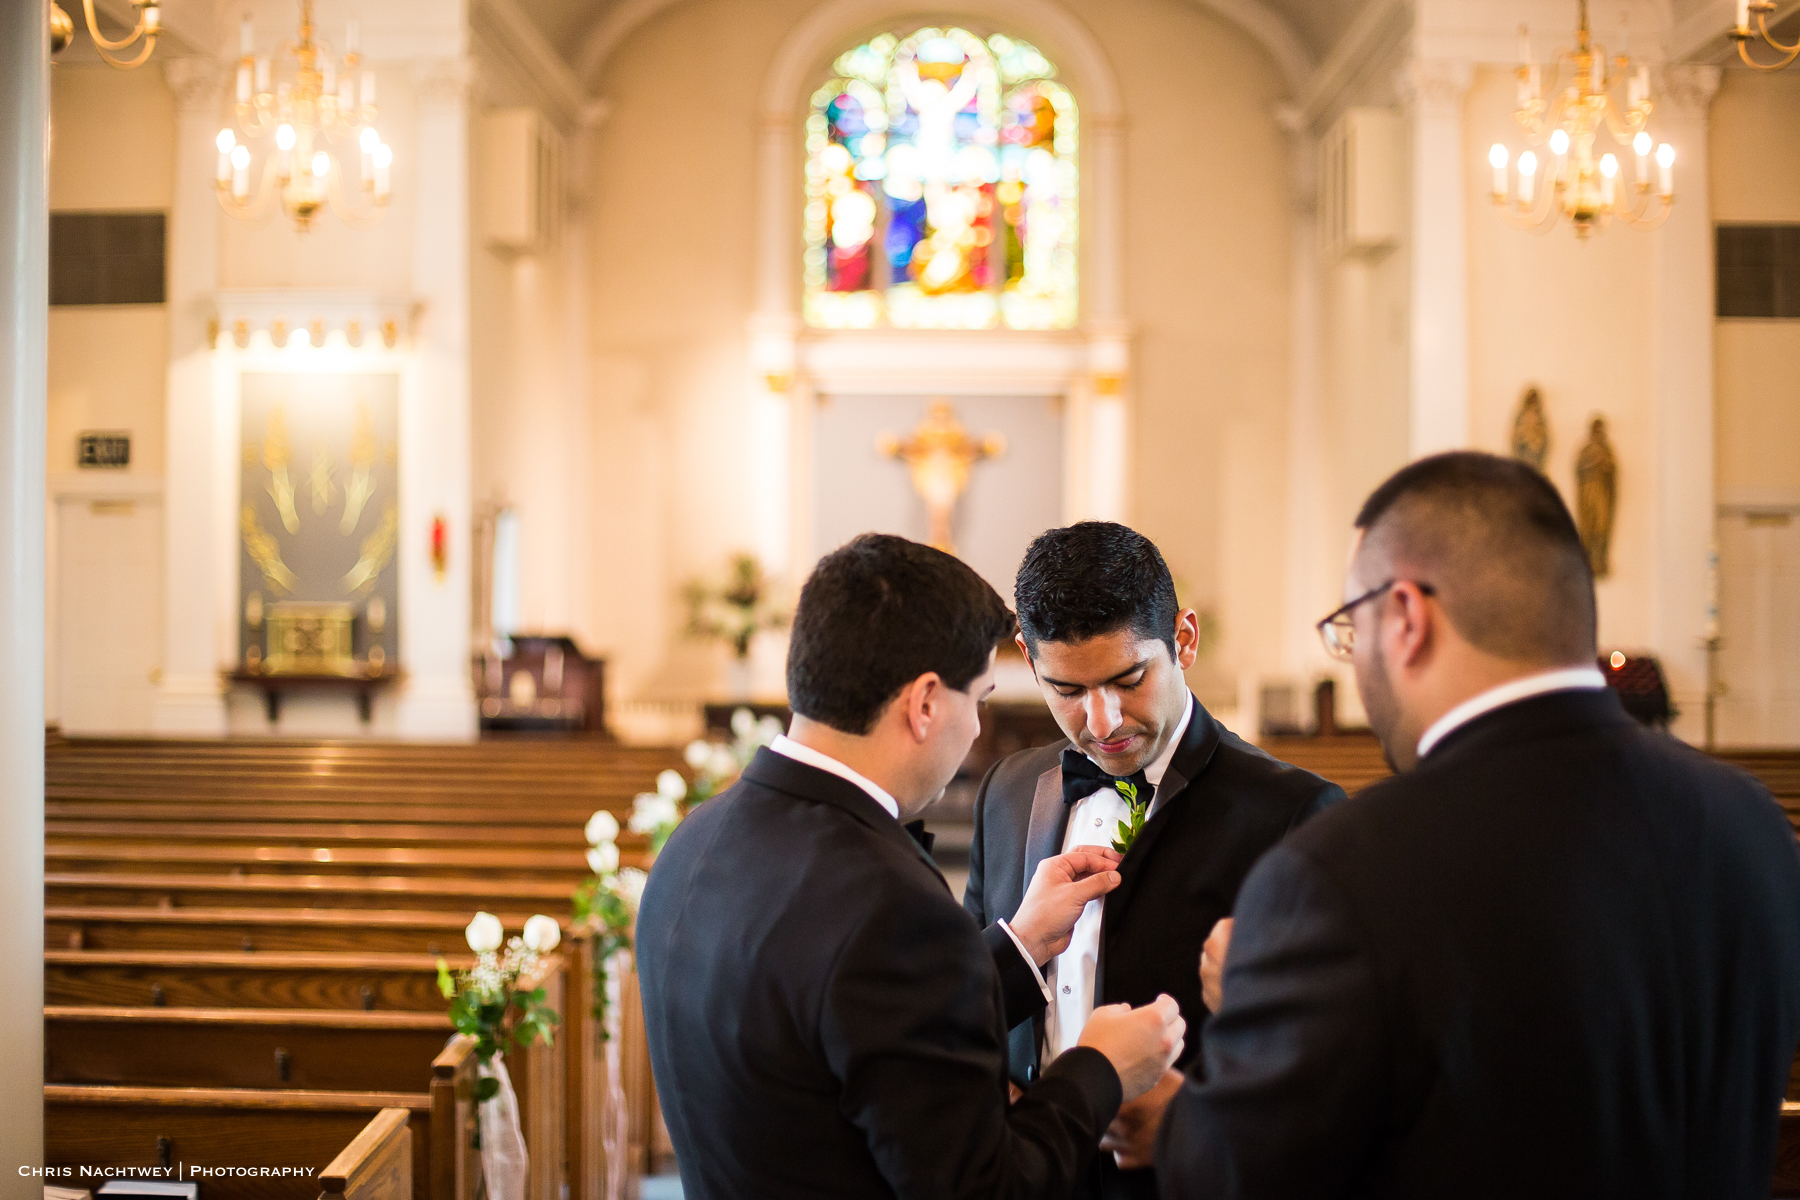 wedding-the-litchfield-inn-ct-photos-chris-nachtwey-photography-2018-15.jpg